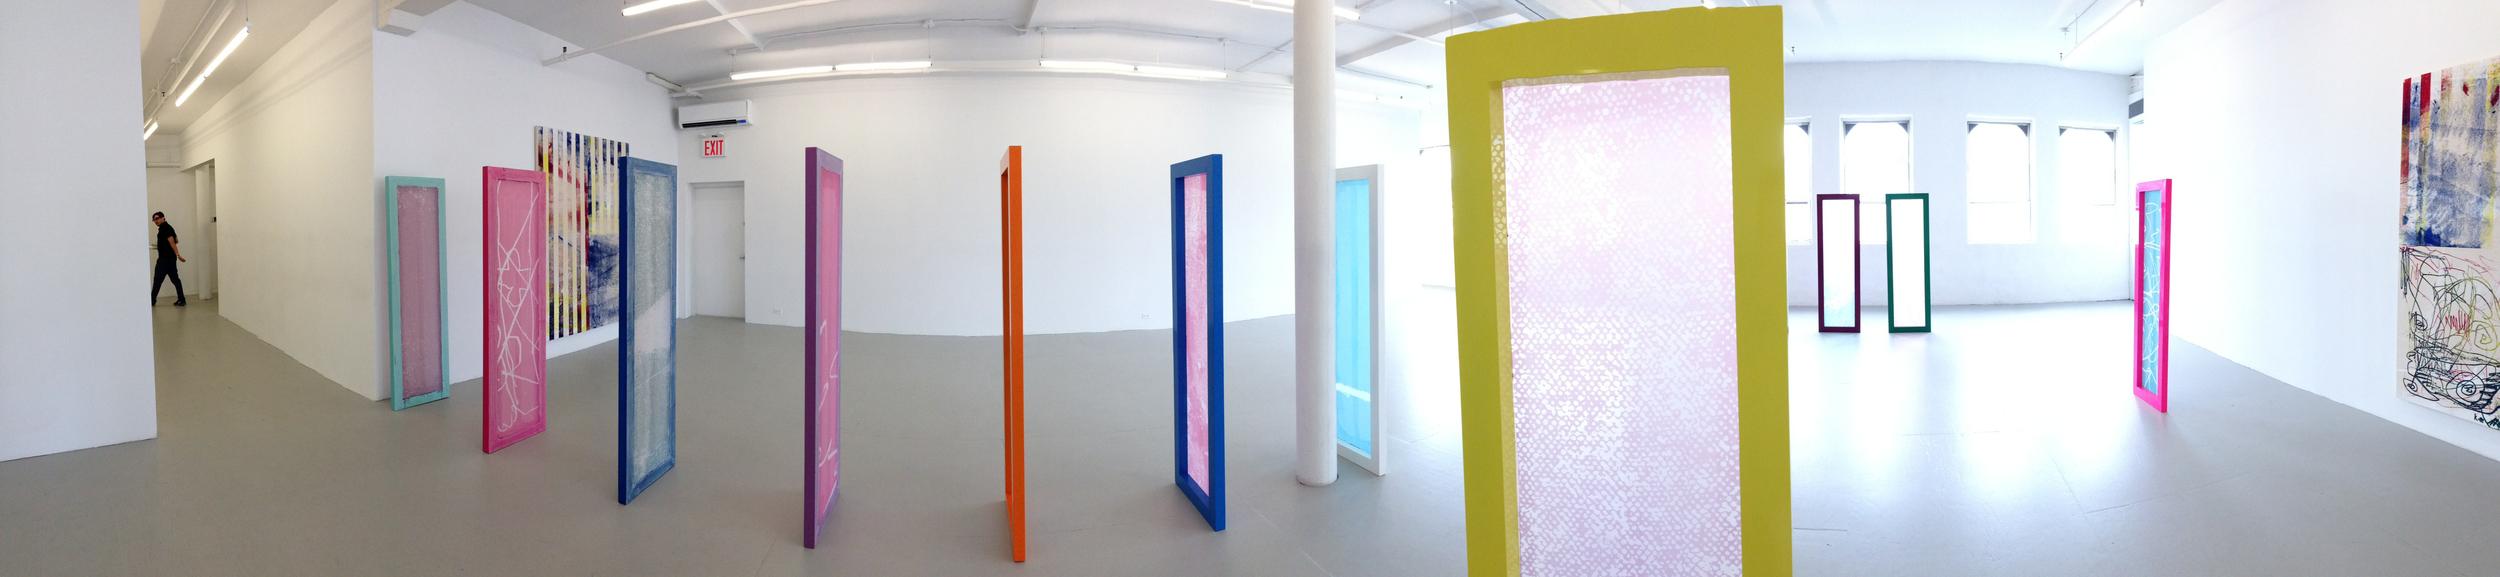 Exhibition Image, Israel Lund  , David Lewis Gallery, New York Photo Credit: Cincala Art Advisory